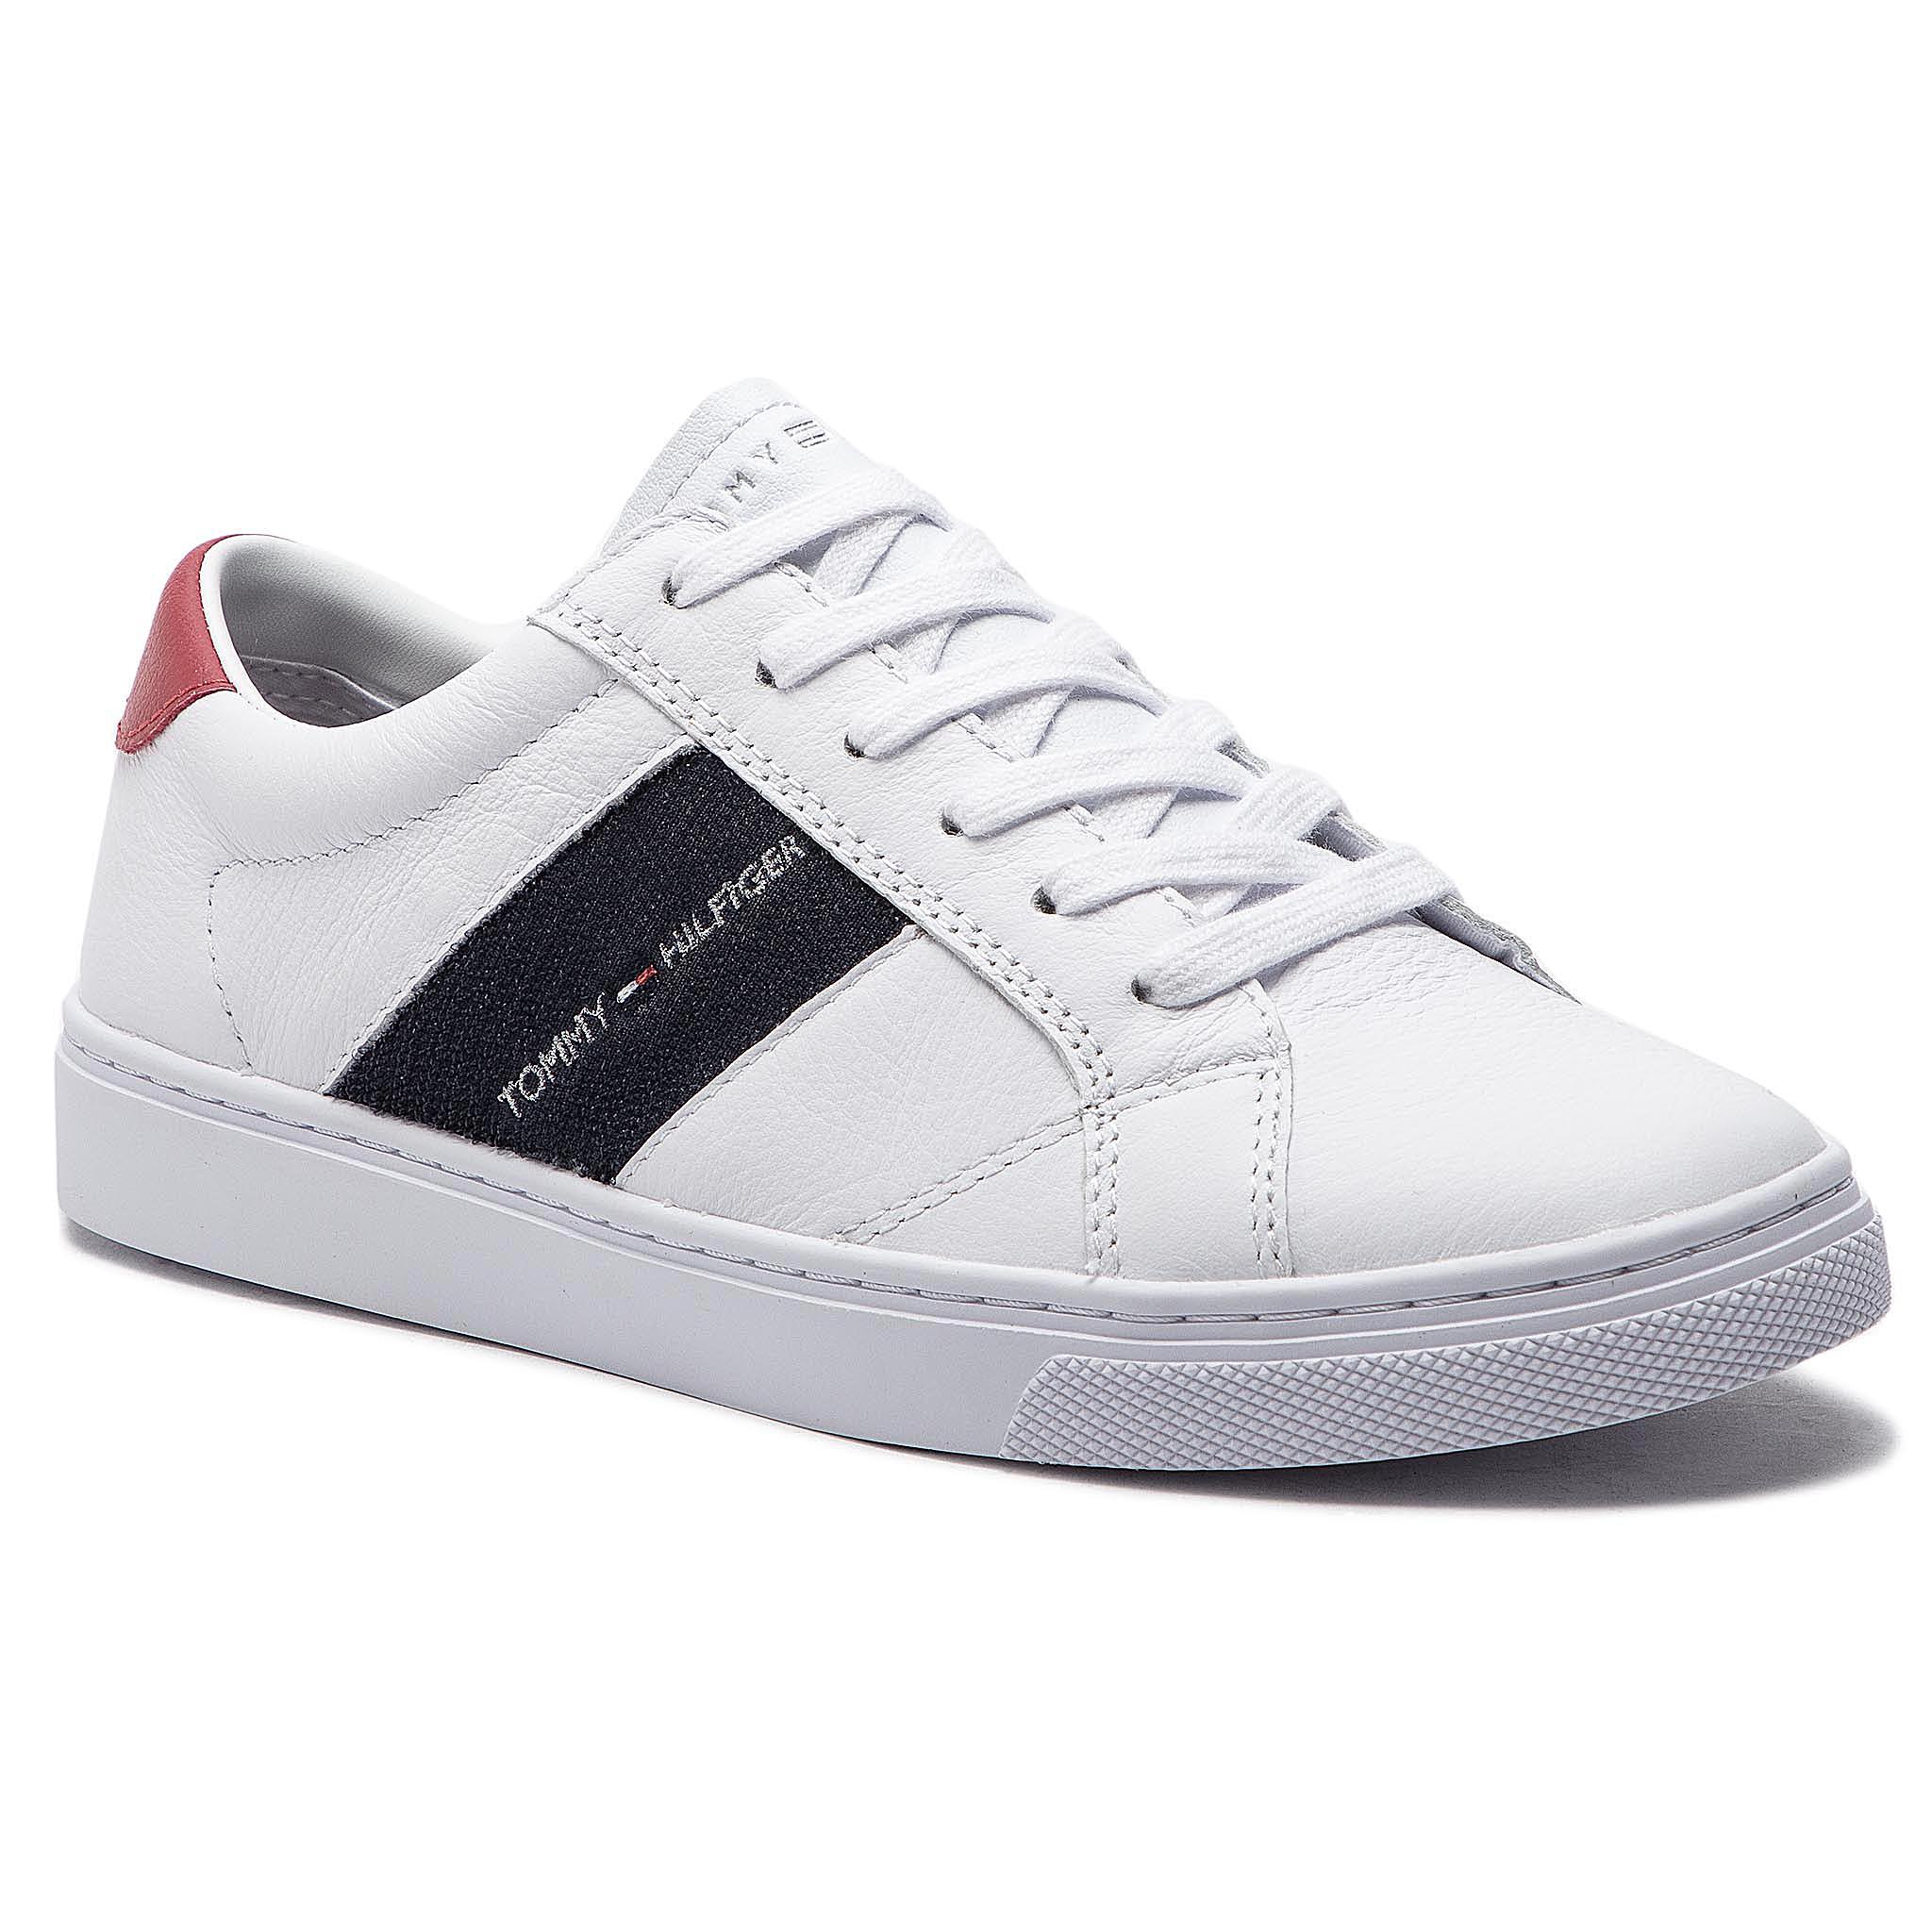 352892ea63 Sportcipő TOMMY HILFIGER - Tommy Playful Badge Sneaker FW0FW03996 White 100